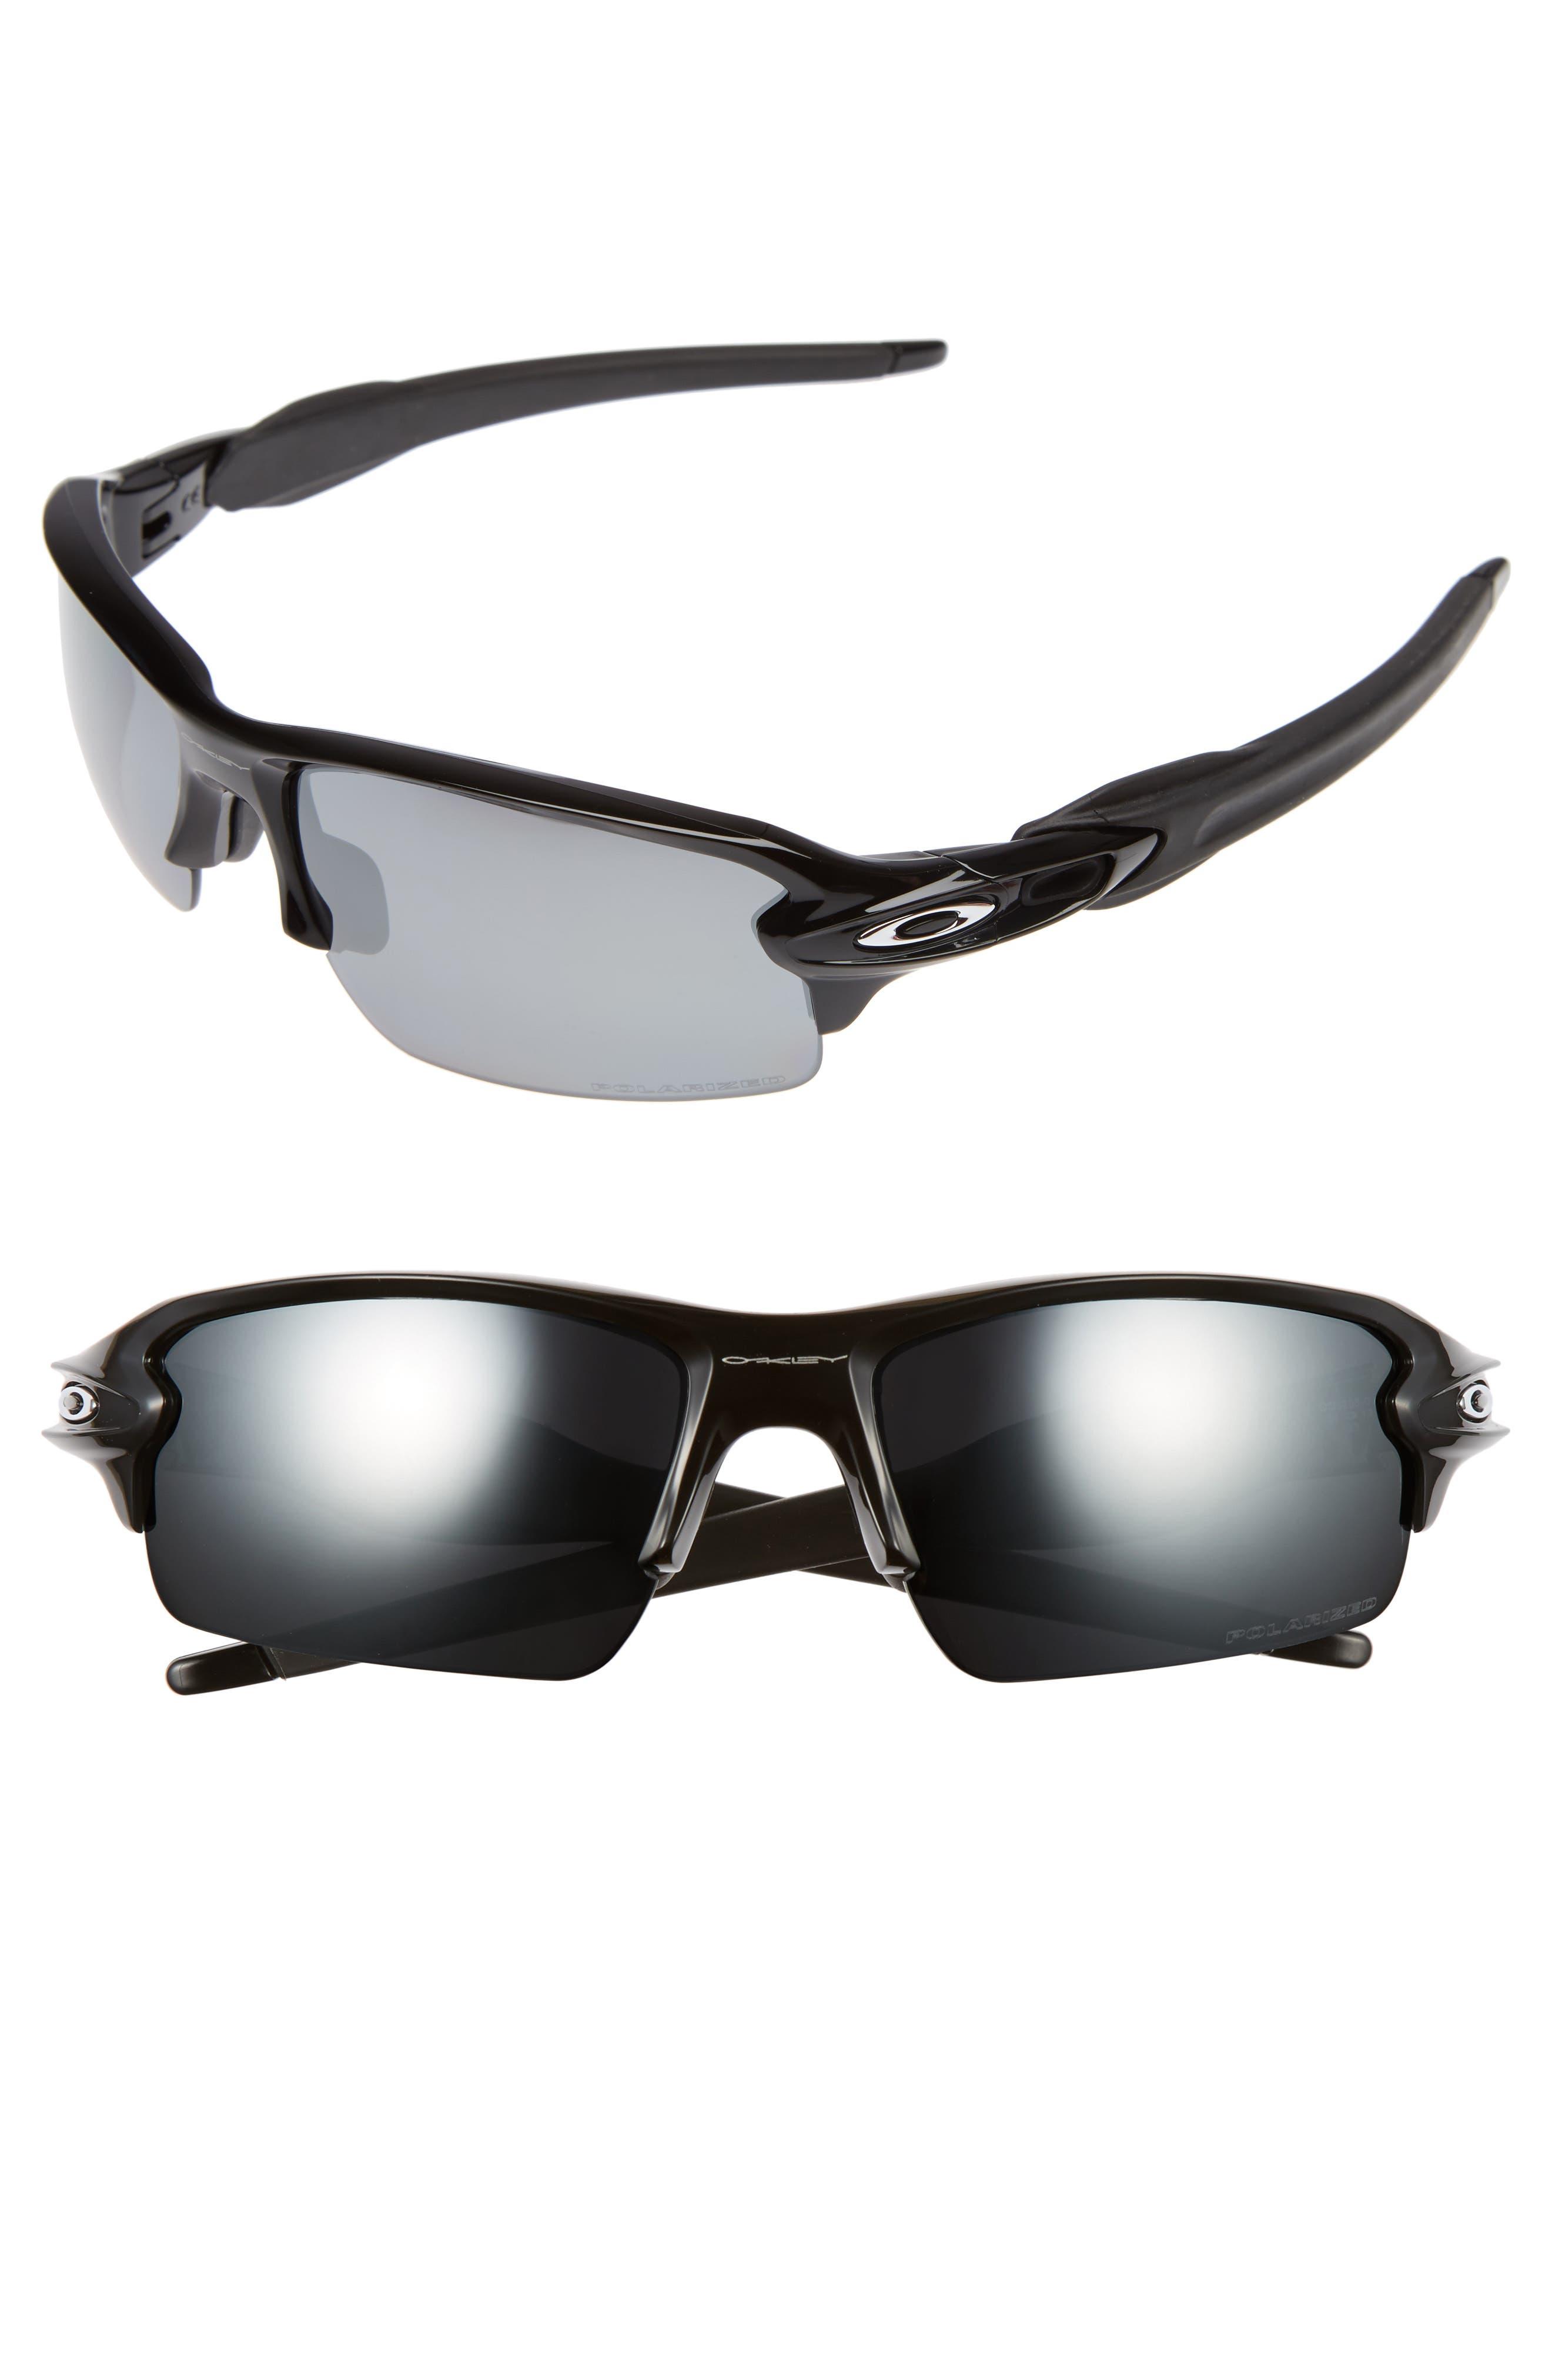 Oakley Flak 2.0 59mm Polarized Sunglasses